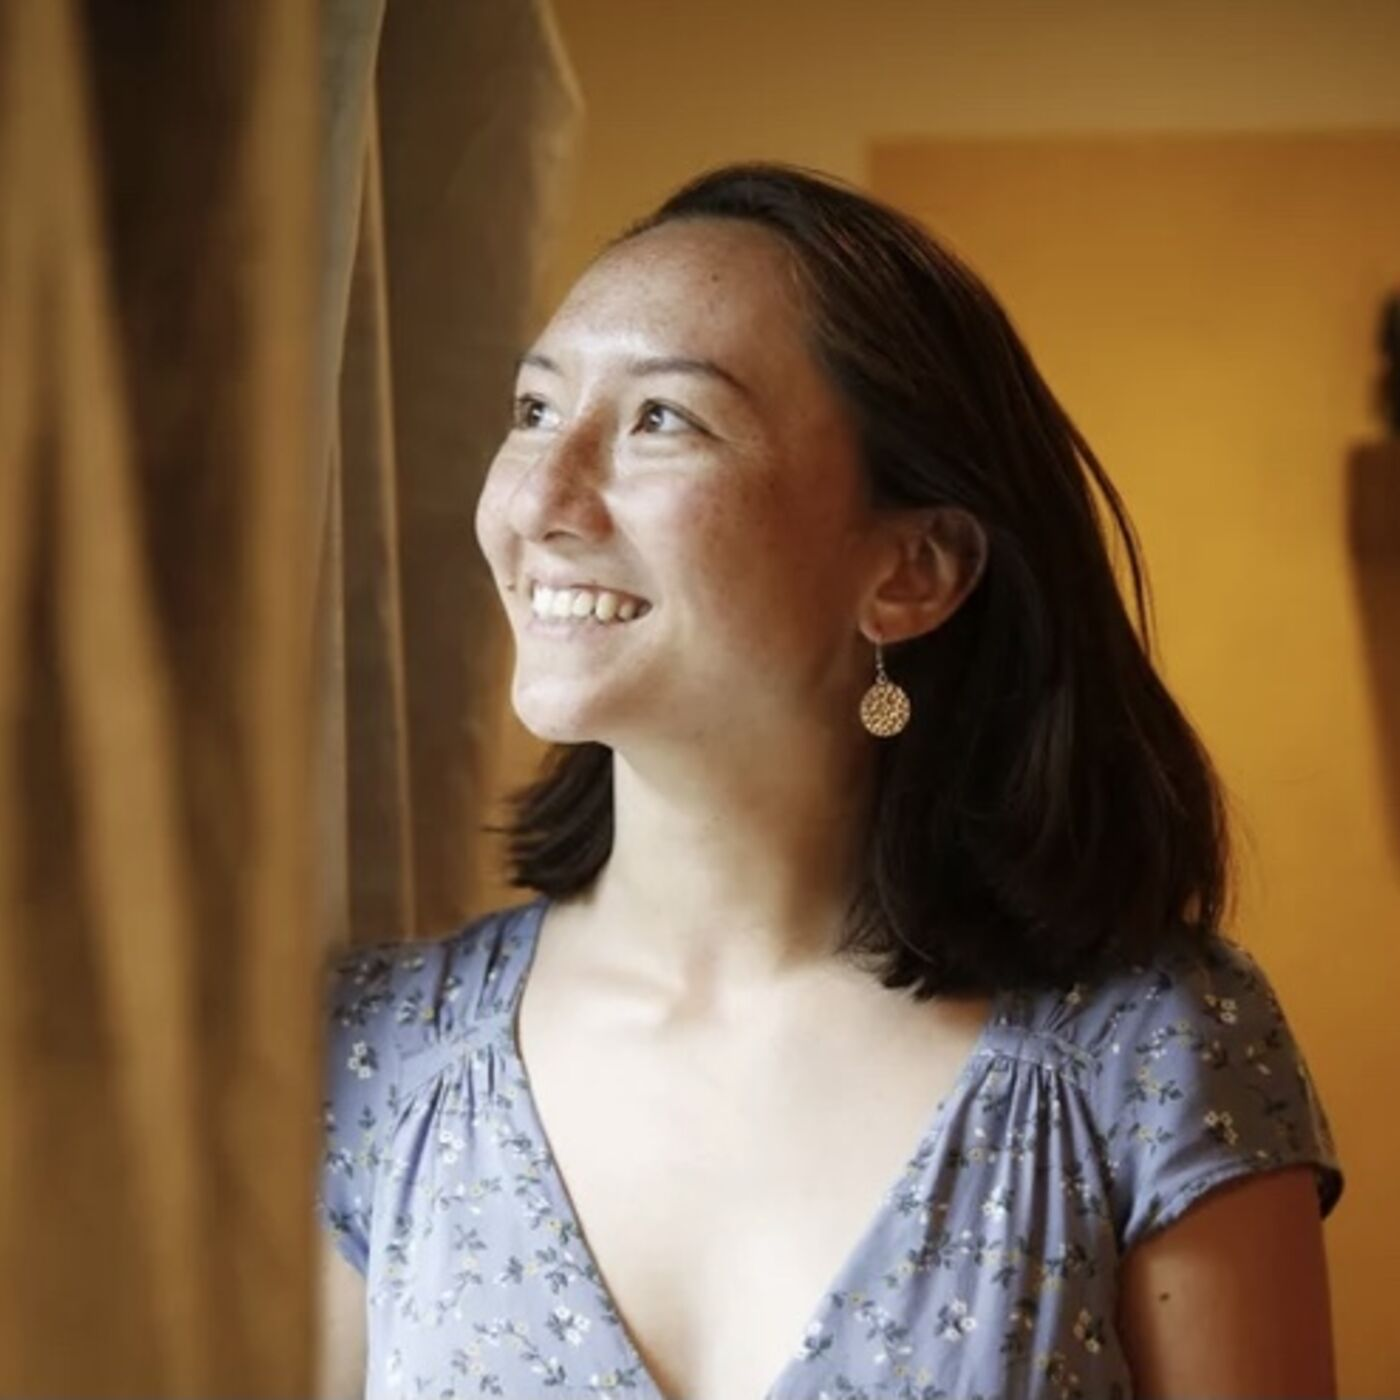 Anya Steinberg NPR Student Podcast Grand Prize Winner